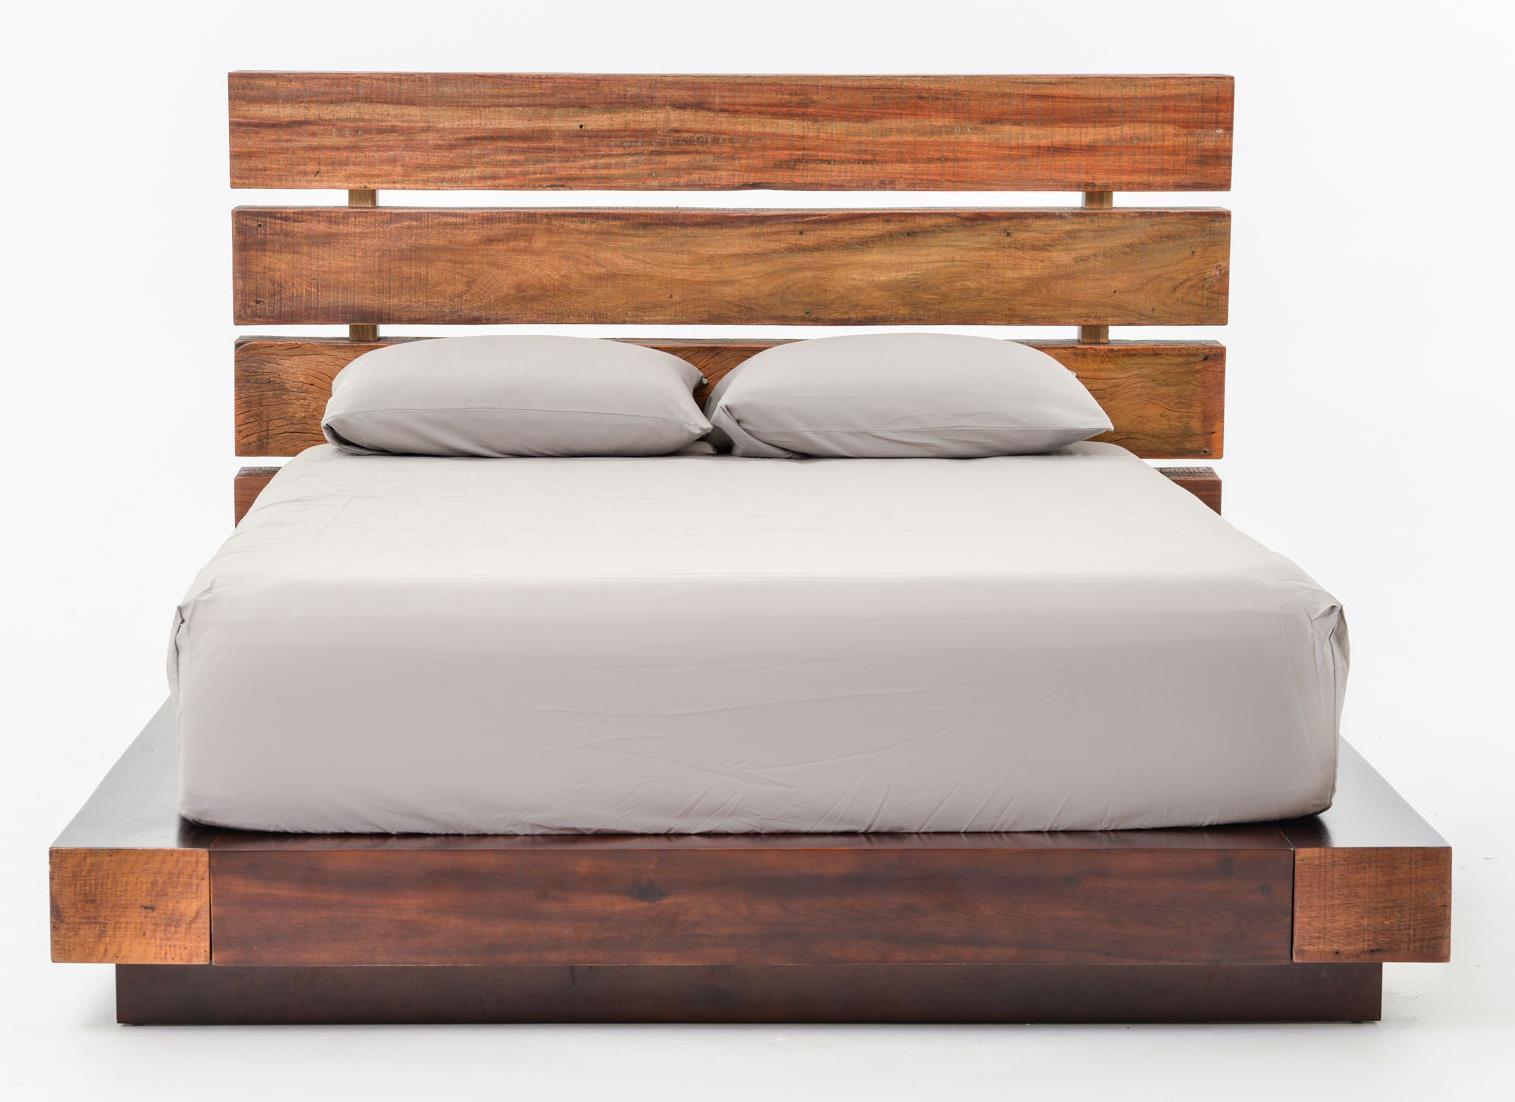 bina iggy reclaimed wood king bed